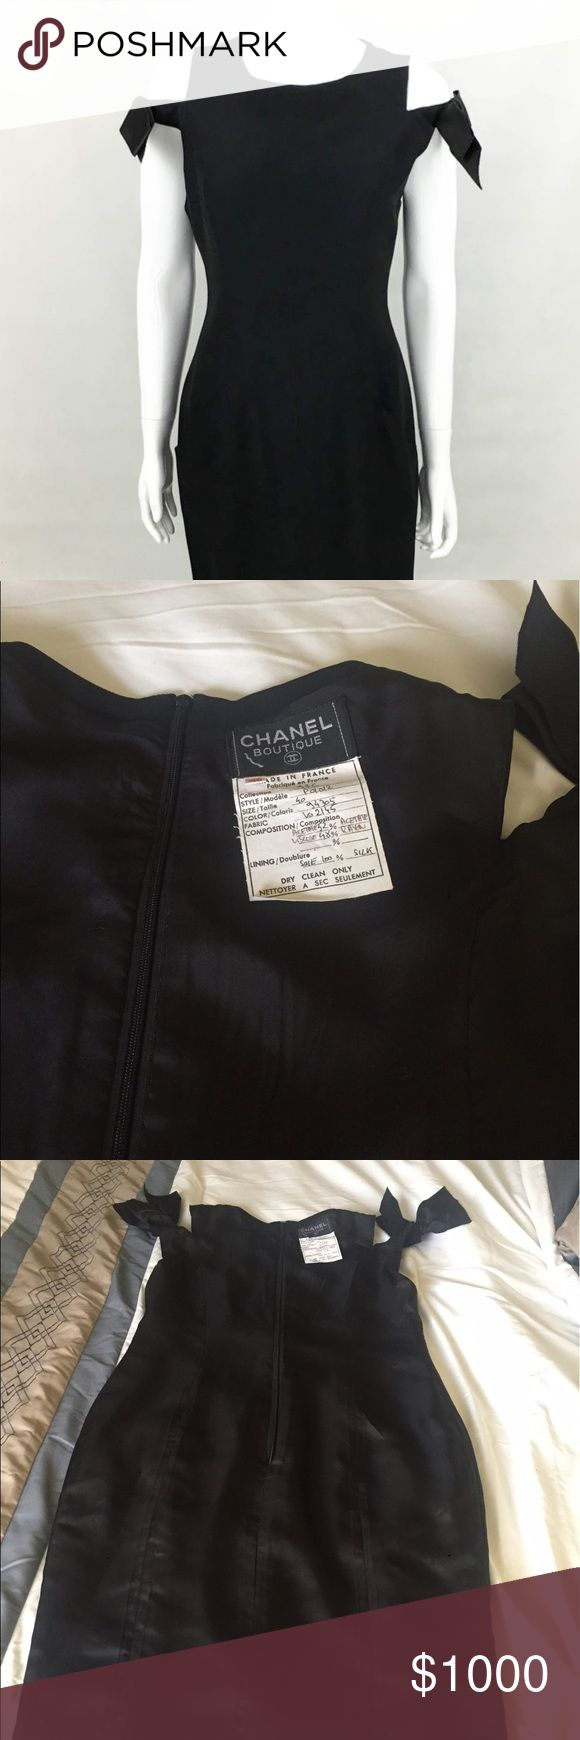 The dress is chanel - Vintage Chanel Black Silk Dress